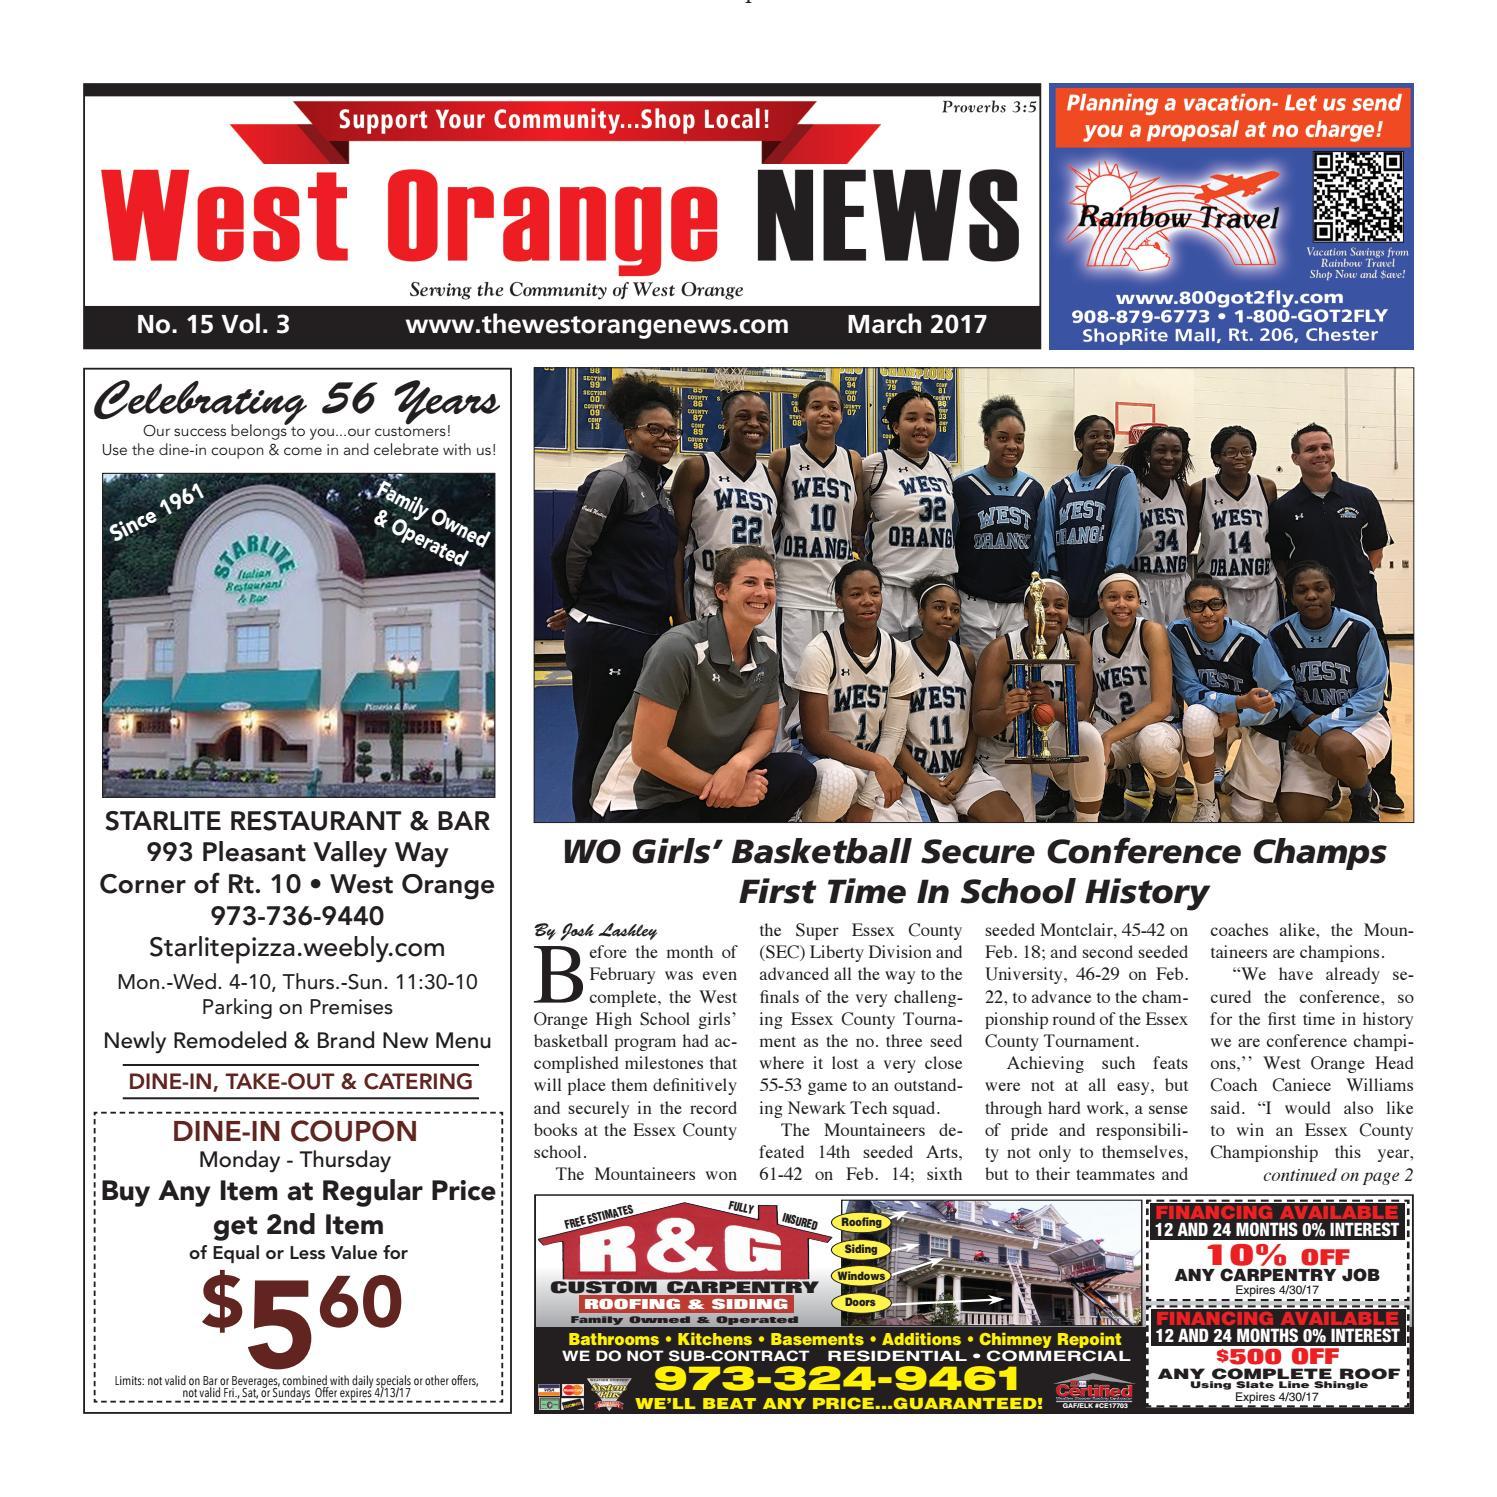 193b9a7dec Z14 west orange march 2017 by New View Media Group LLC - issuu